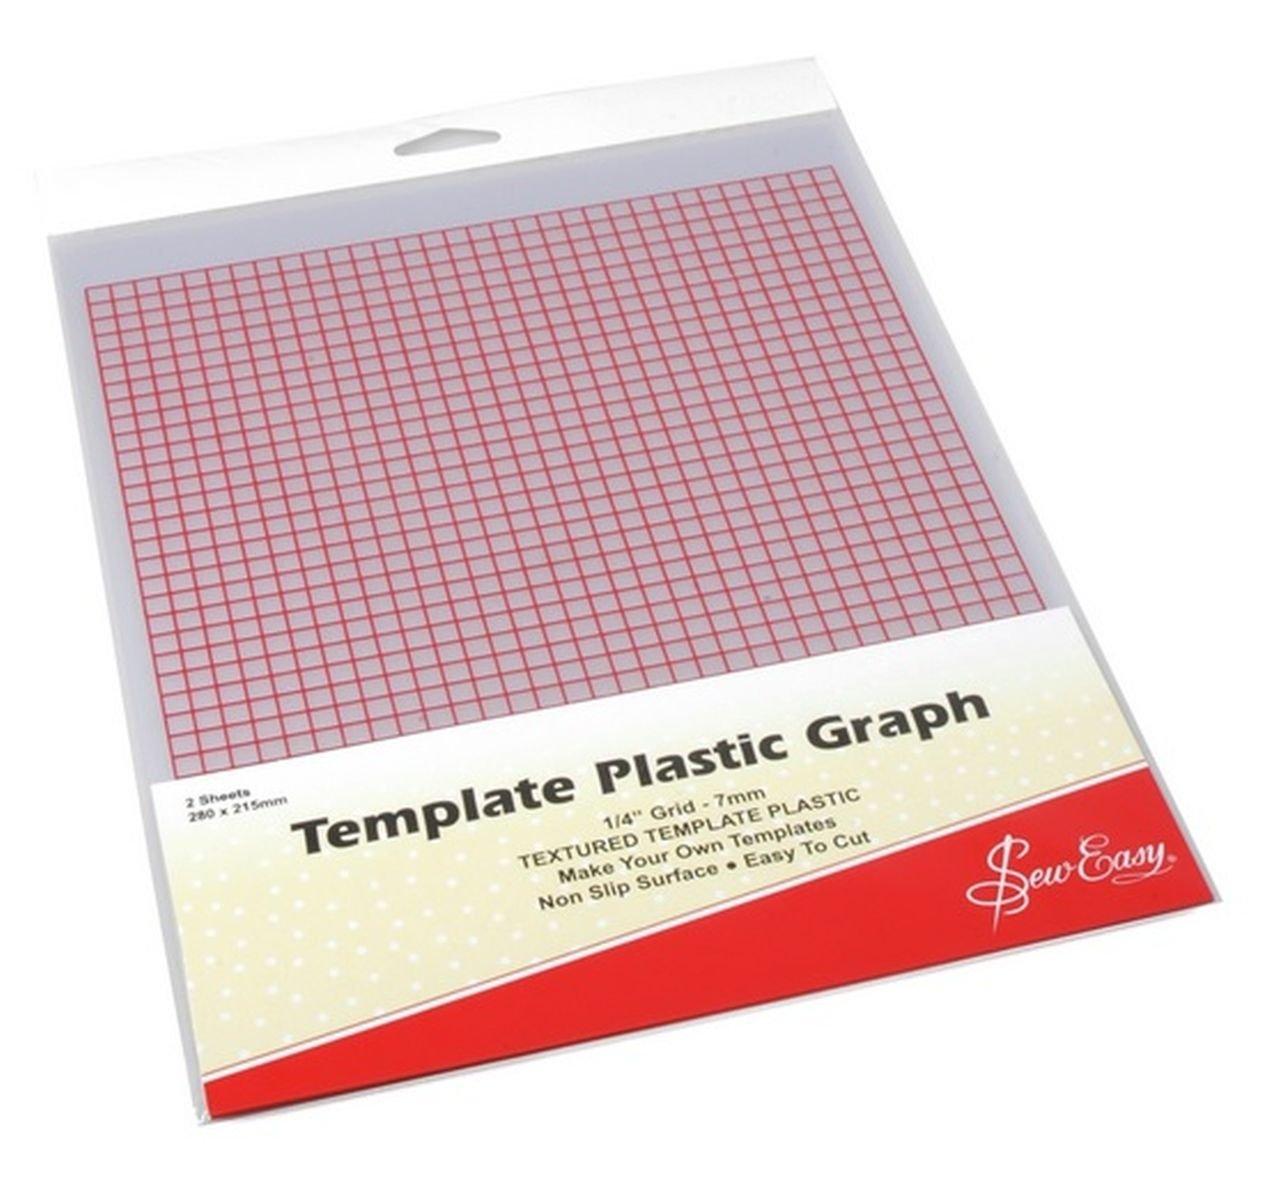 Amazon.com: Sew Easy Template Plastic Graph, Pk Of 2 Sheets, 280 X ...